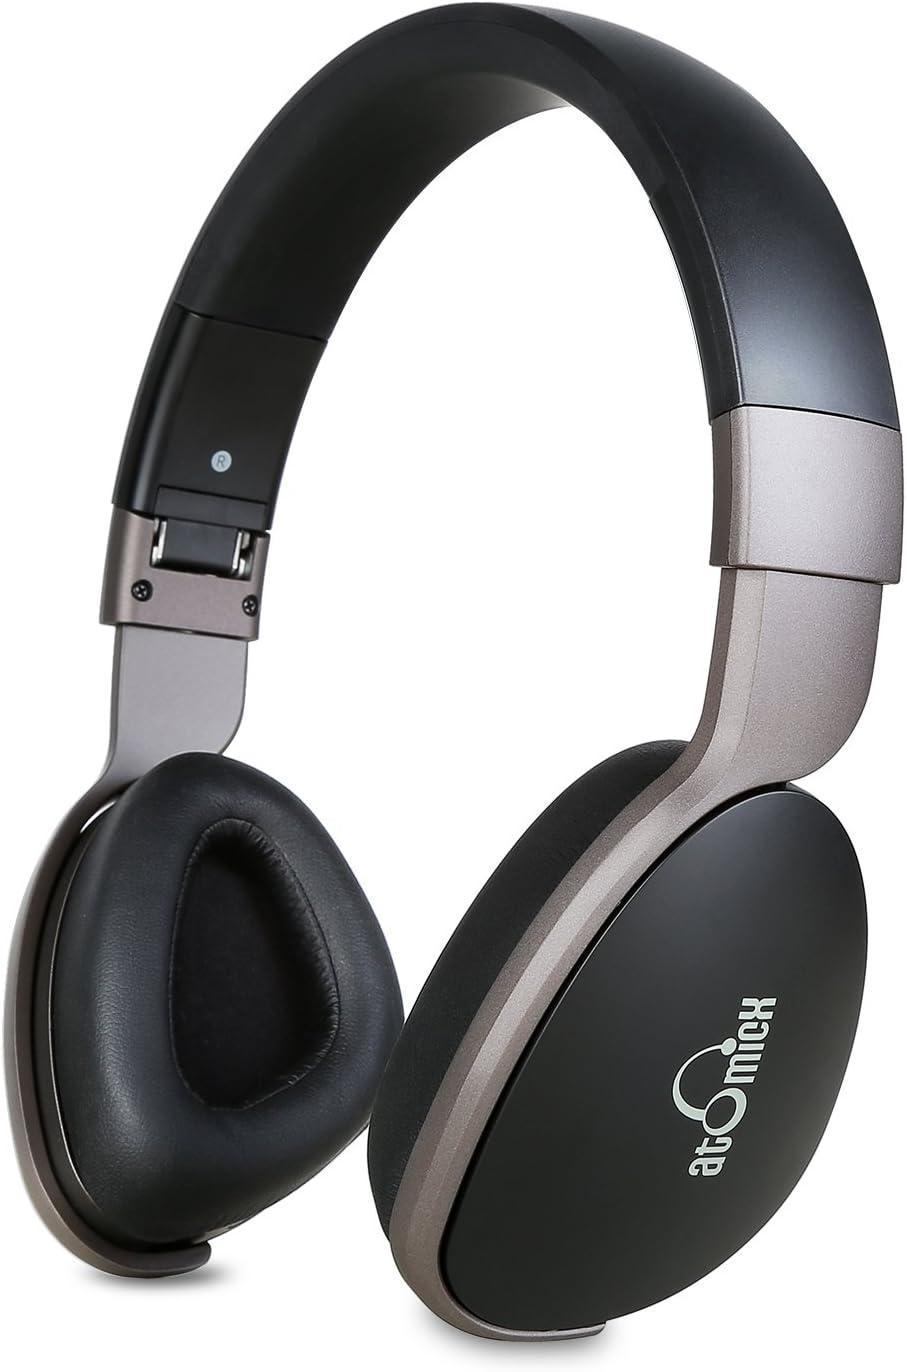 iDeaUSA Auriculares Bluetooth, TV Auriculares con Aislamiento de Ruido Auriculares inalámbricos con micrófono de Diadema 20 Horas de reproducción para Smartphones PC portátil – Negro/Gris: Amazon.es: Electrónica